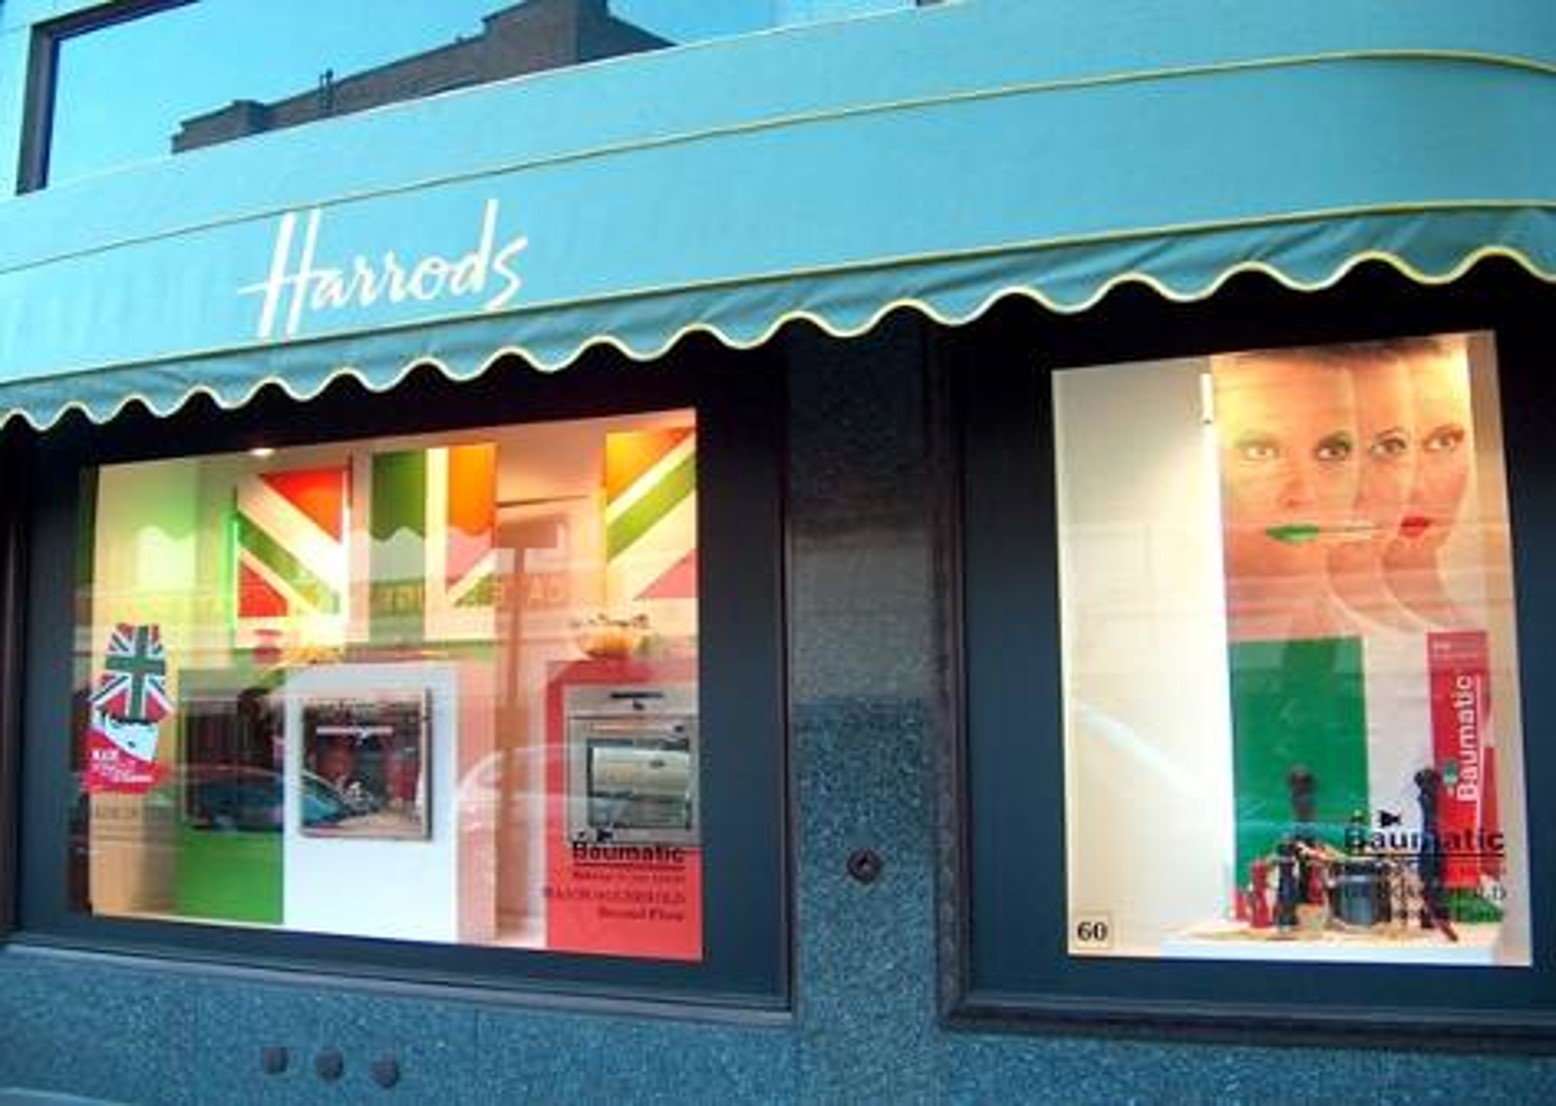 Baumatic's window display in Harrods